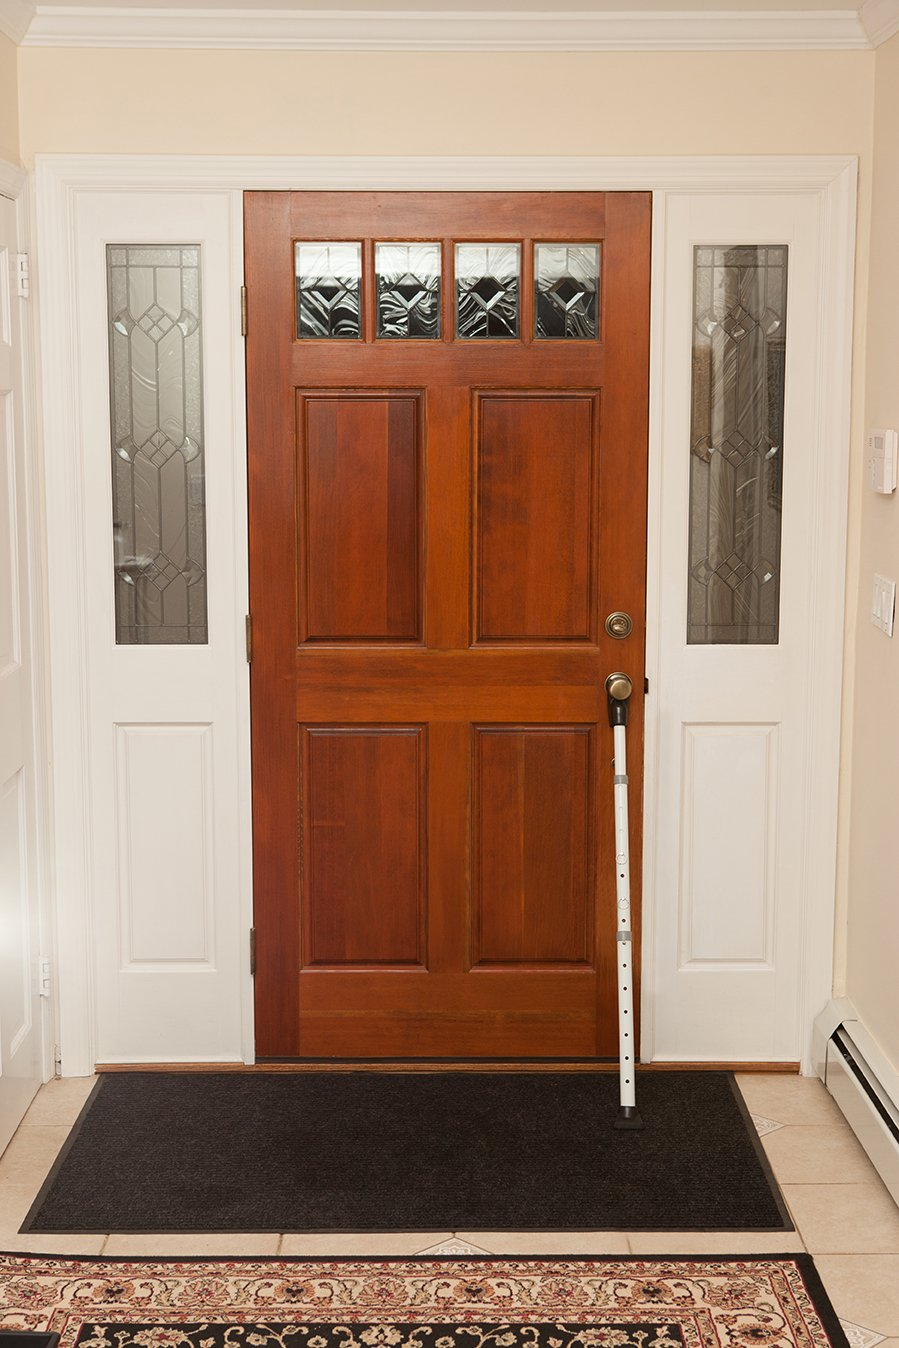 Mace Brand 80116 Jammer Home Security Door Brace by Mace (Image #5)